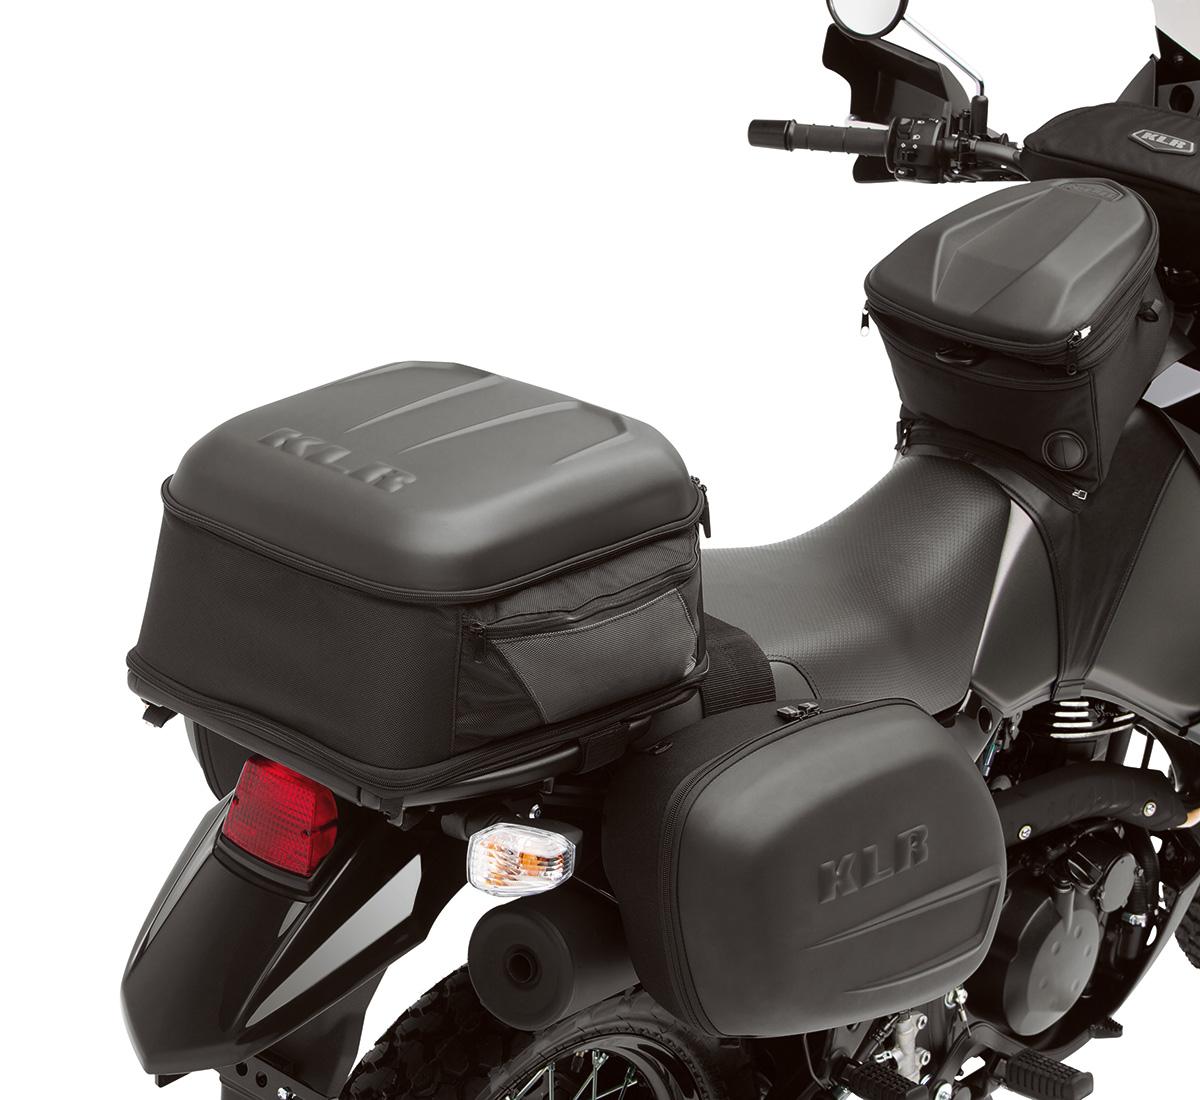 Ninja 650r Fuse Box as well 52849 New Honda Rider likewise kawasaki together with 2013mercedesbenzgl500australia05 additionally 32627 Honda Launches Cbr650f 7 3 Lakh Ex Showroom Delhi Also Showcased 4 Other Bikes 7. on 2013 ninja 650 bags